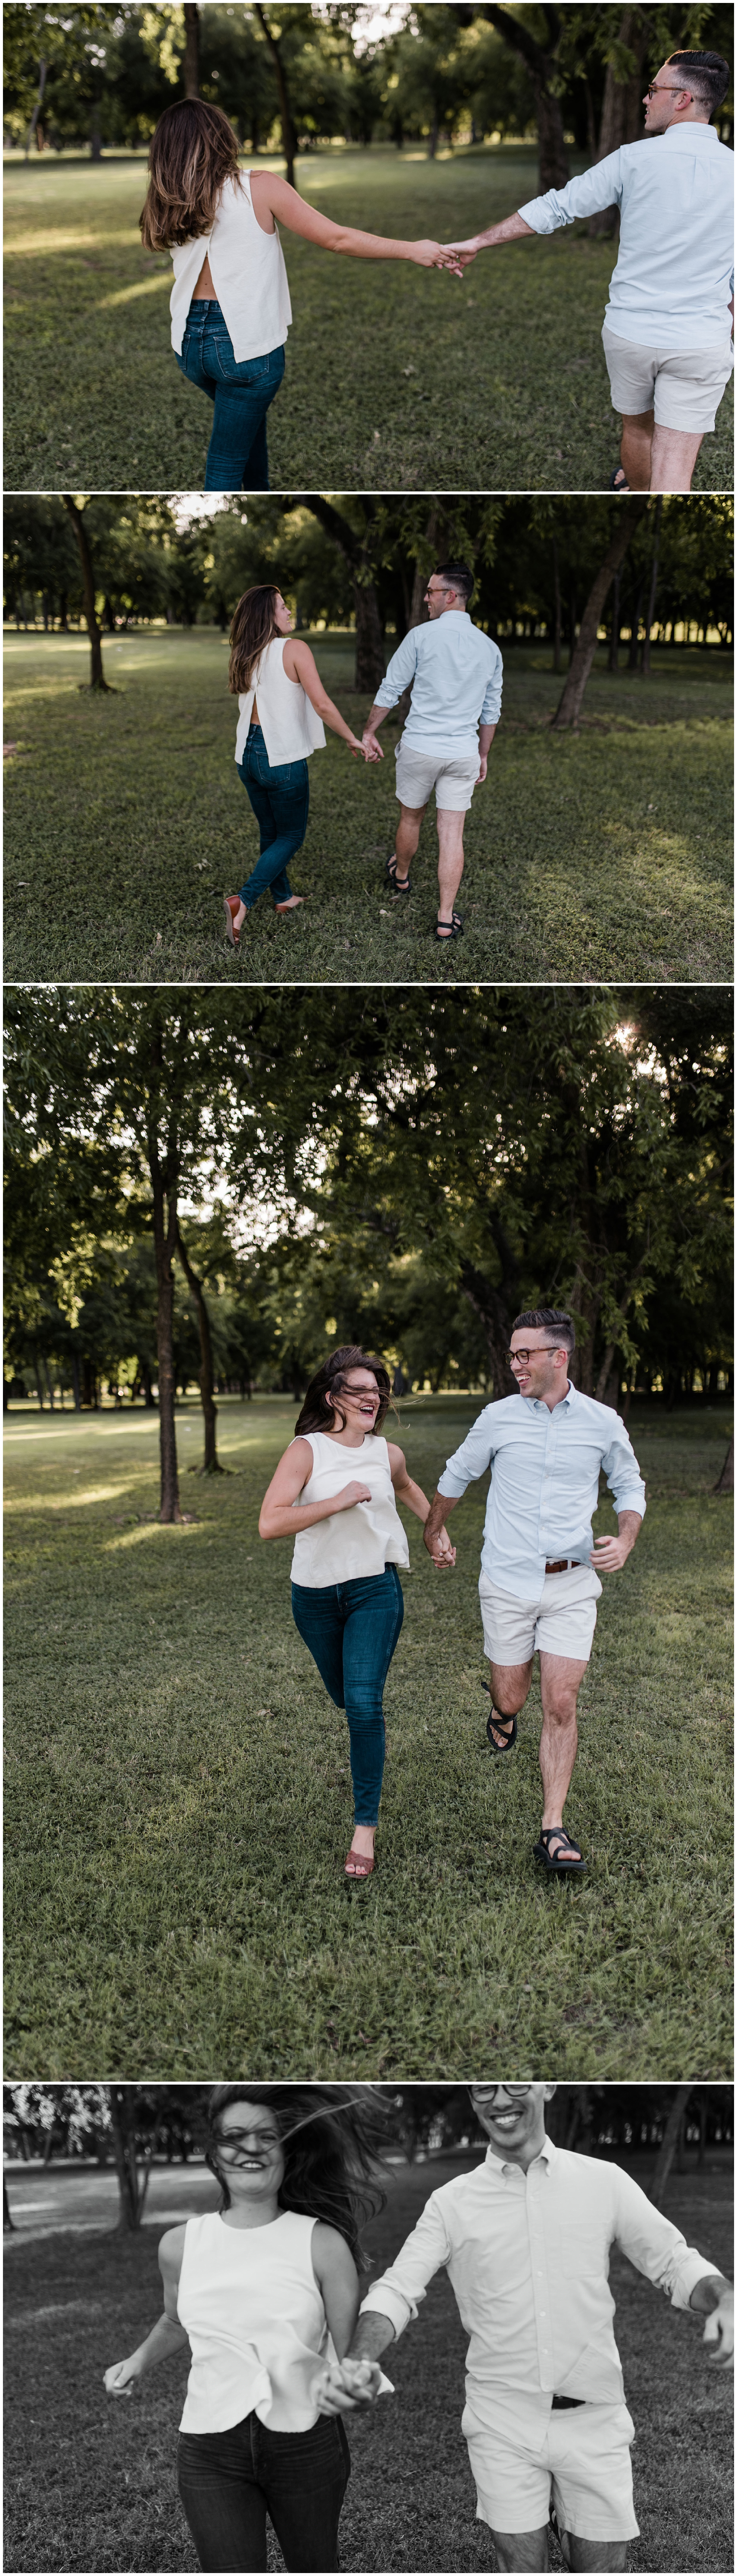 trinity park engagement session | Fort Worth engagement session | Fort Worth wedding photographer | www.jordanmitchellphotography.com